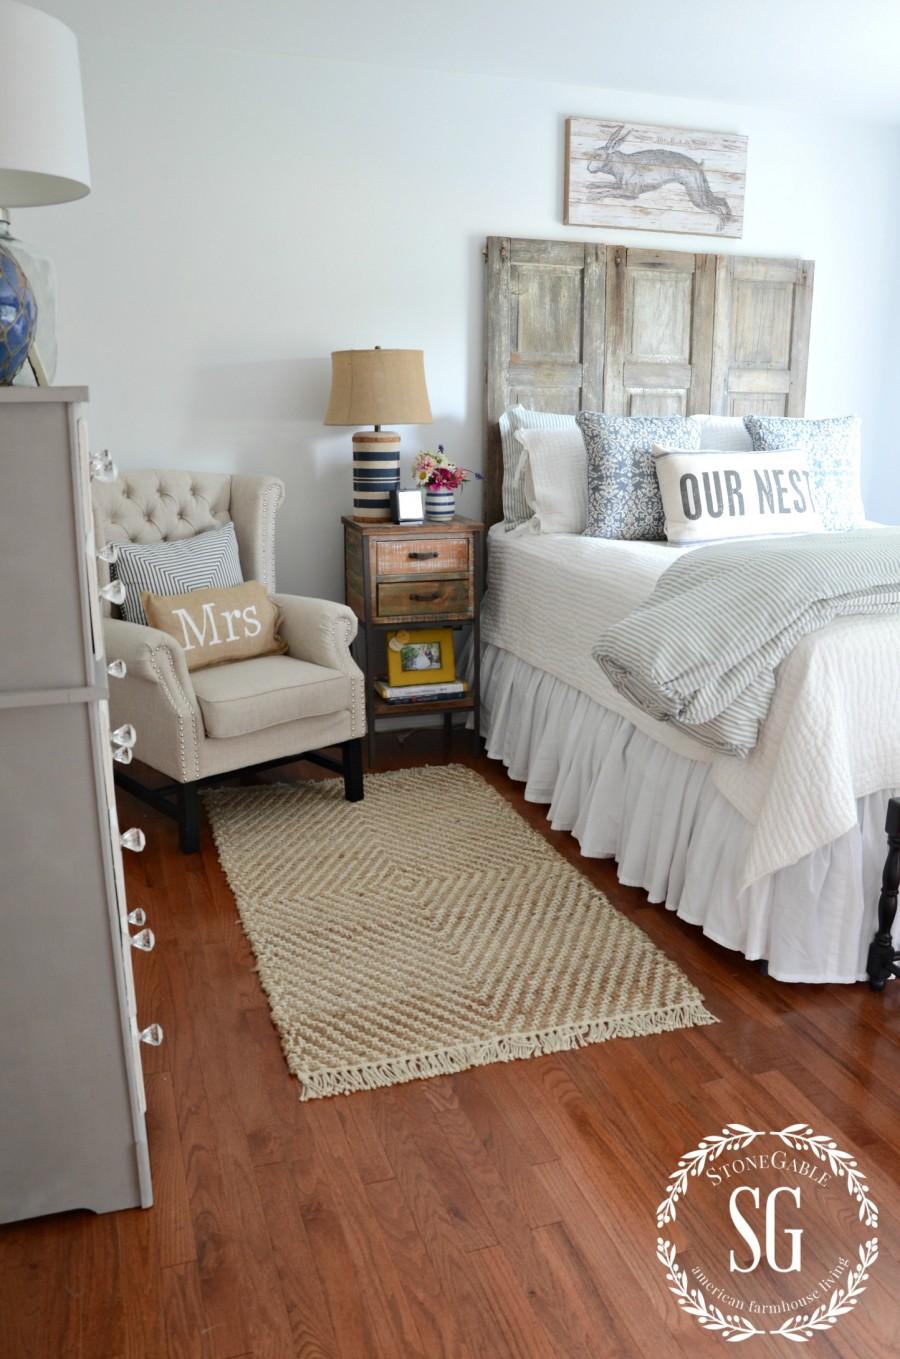 BLUE AND WHITE GUEST ROOM-blue and white dresser-stonegableblog.com